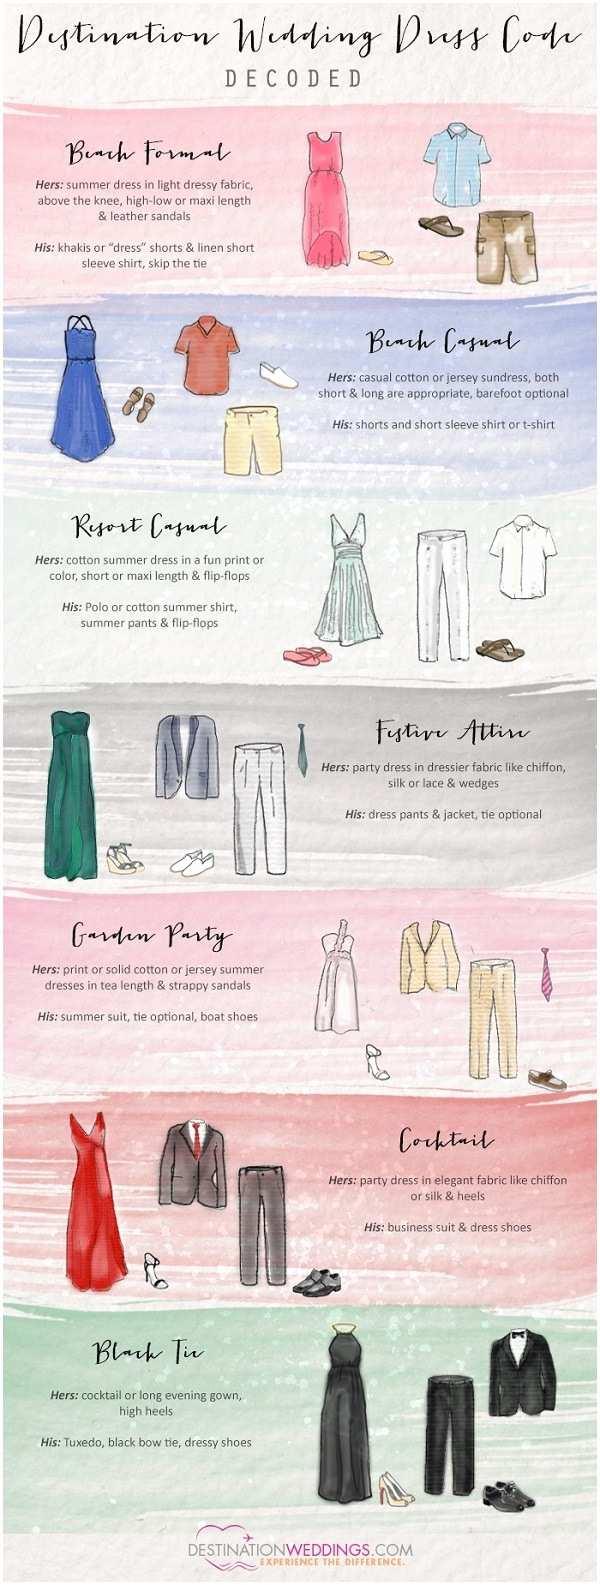 Wedding Invitation Dress Code Destination Wedding Dress Code –